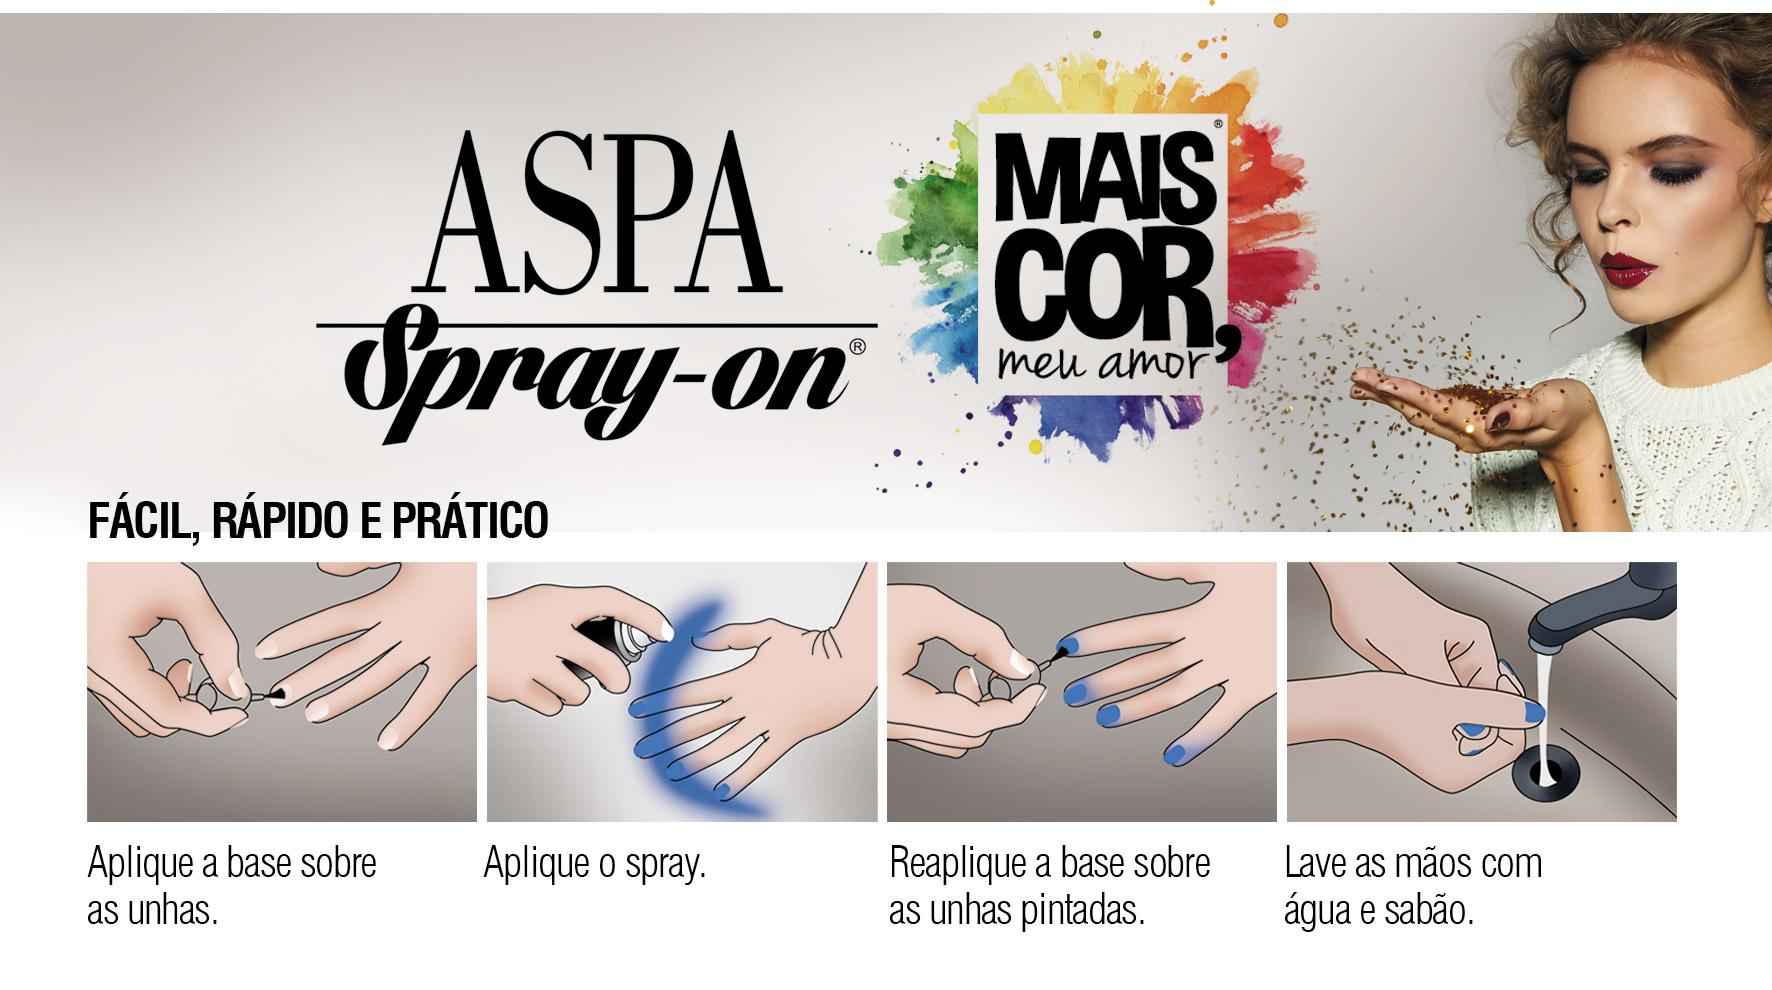 aspa-sprayon-passo-a-passo.jpg